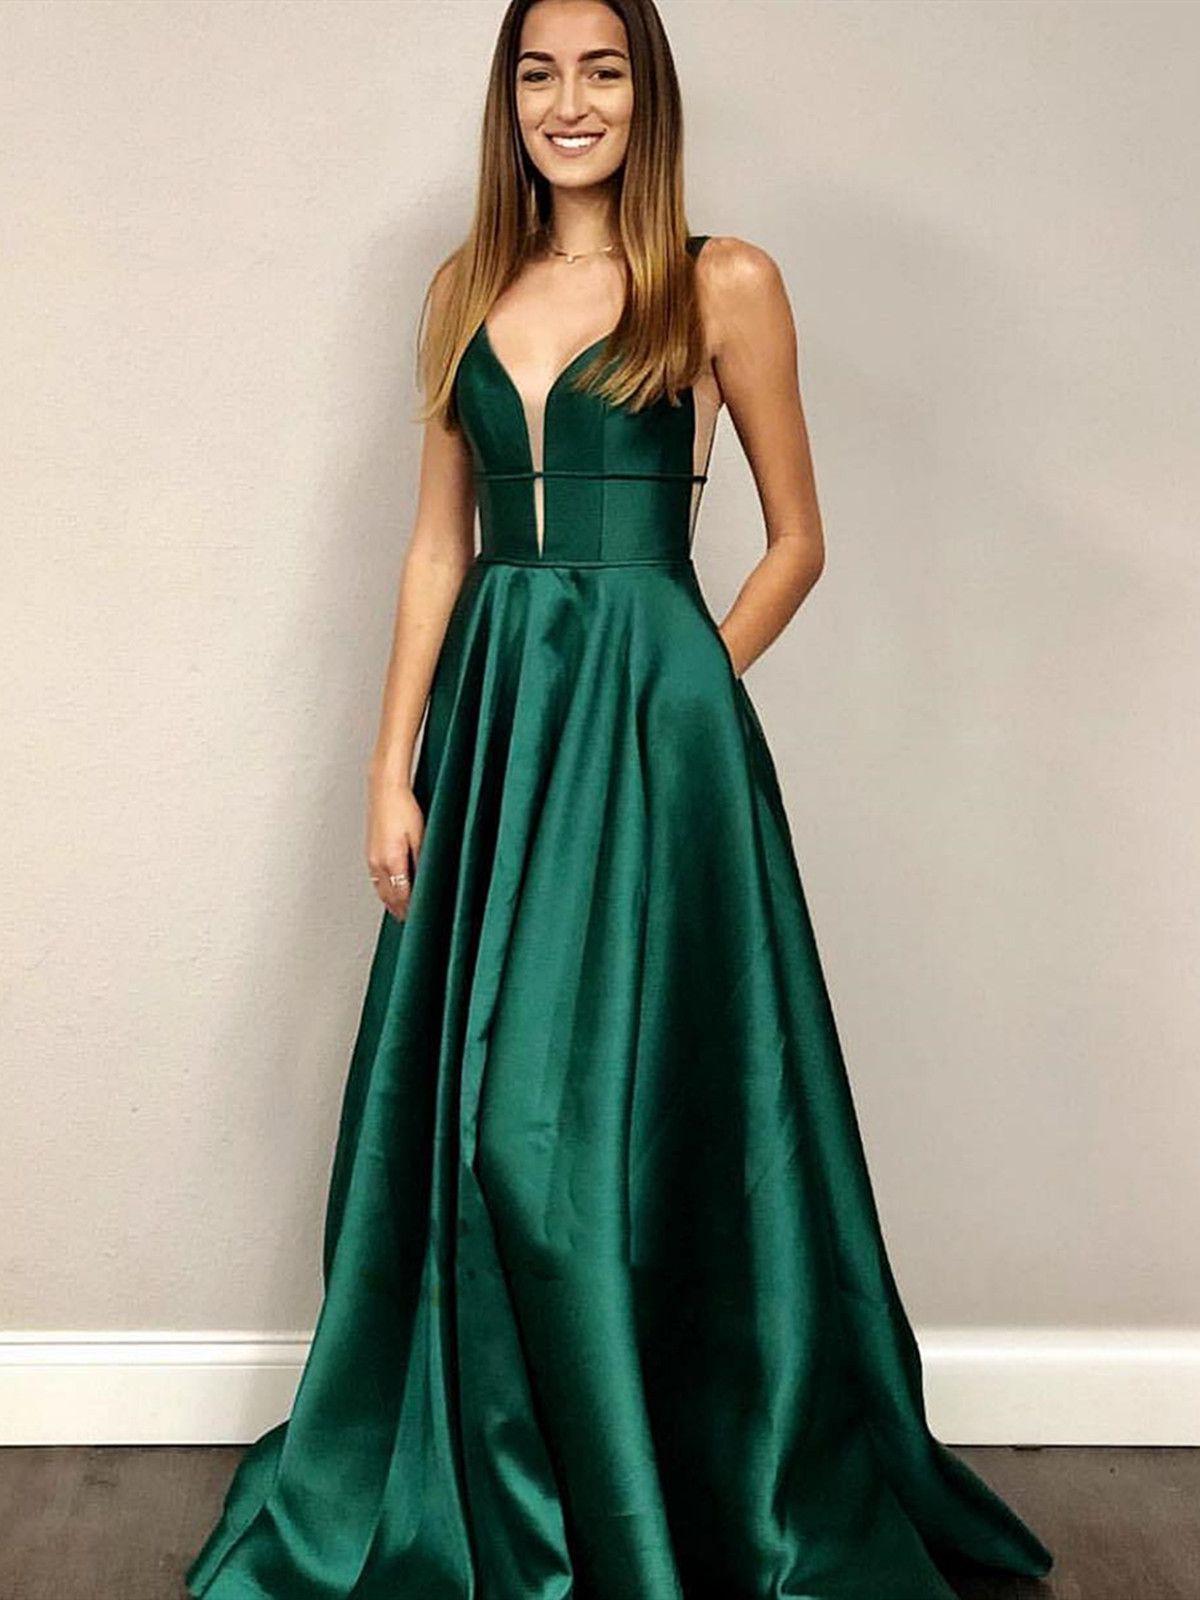 Deep V Neck Emerald Green Prom Dresses V Neck Green Formal Graduation Evening Dresses In 2021 Prom Dresses Emerald Green Prom Dress Green Prom Dress [ 1600 x 1200 Pixel ]